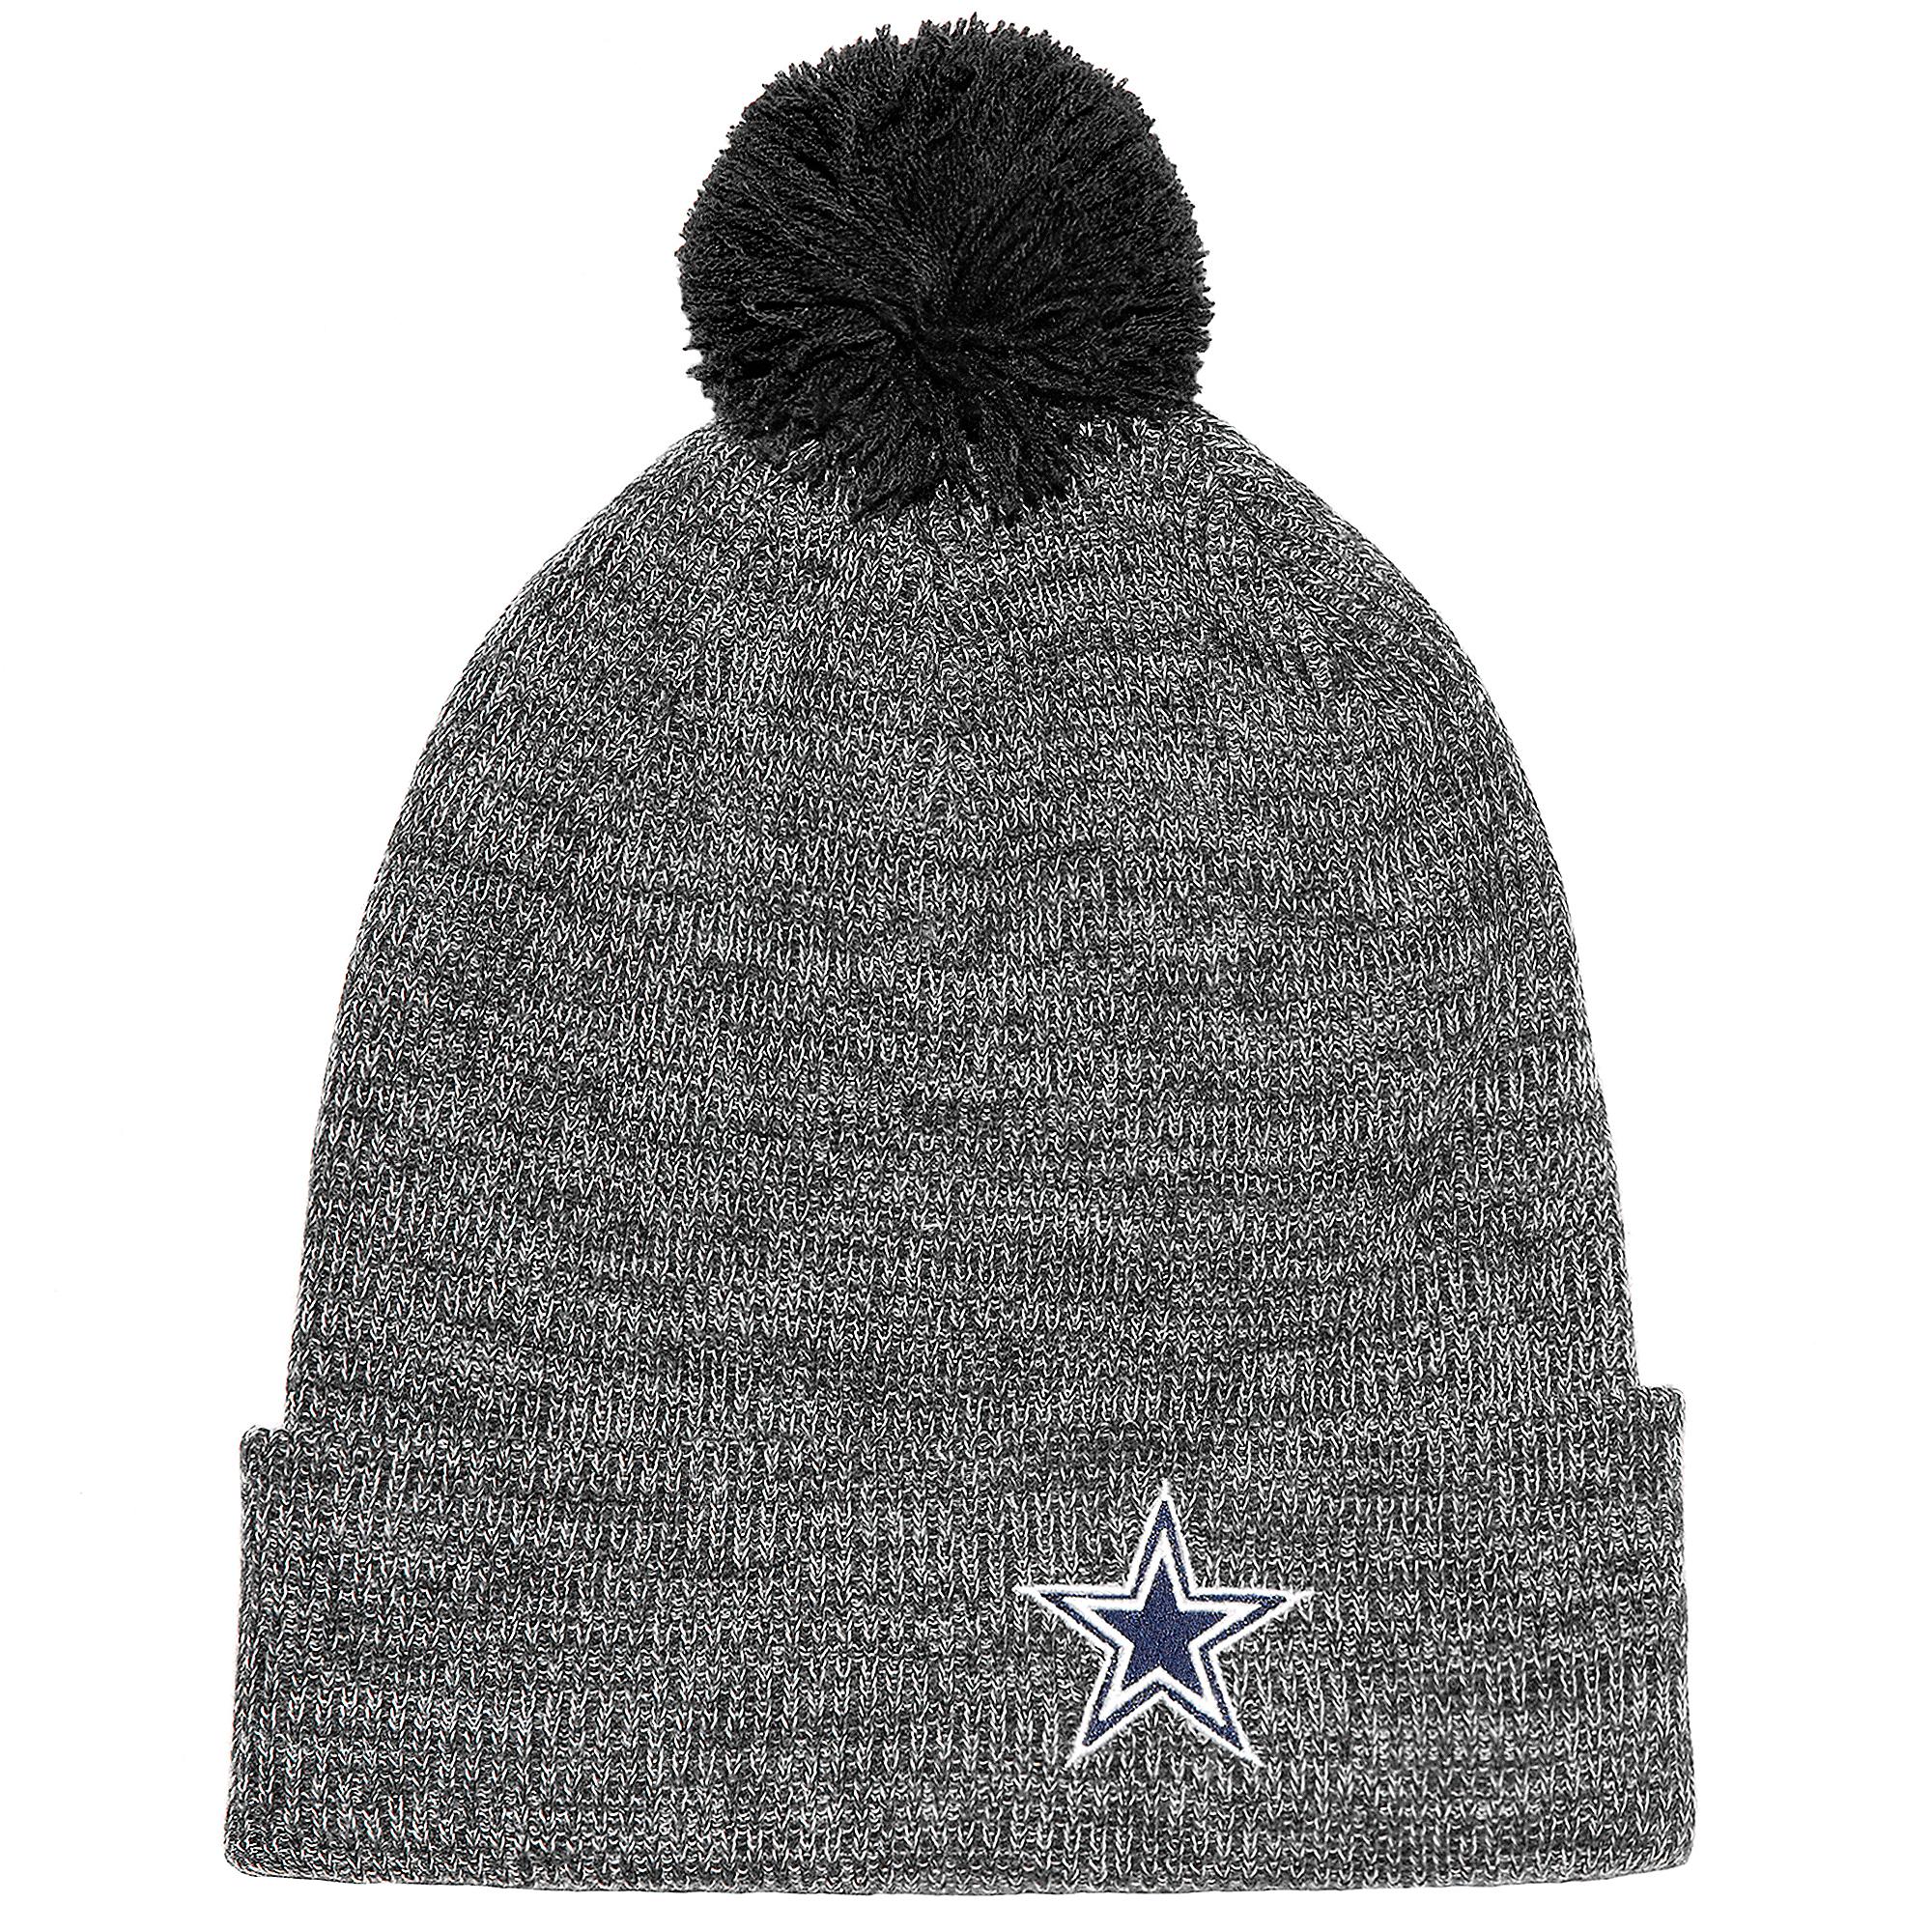 Dallas Cowboys Nike New Day Beanie